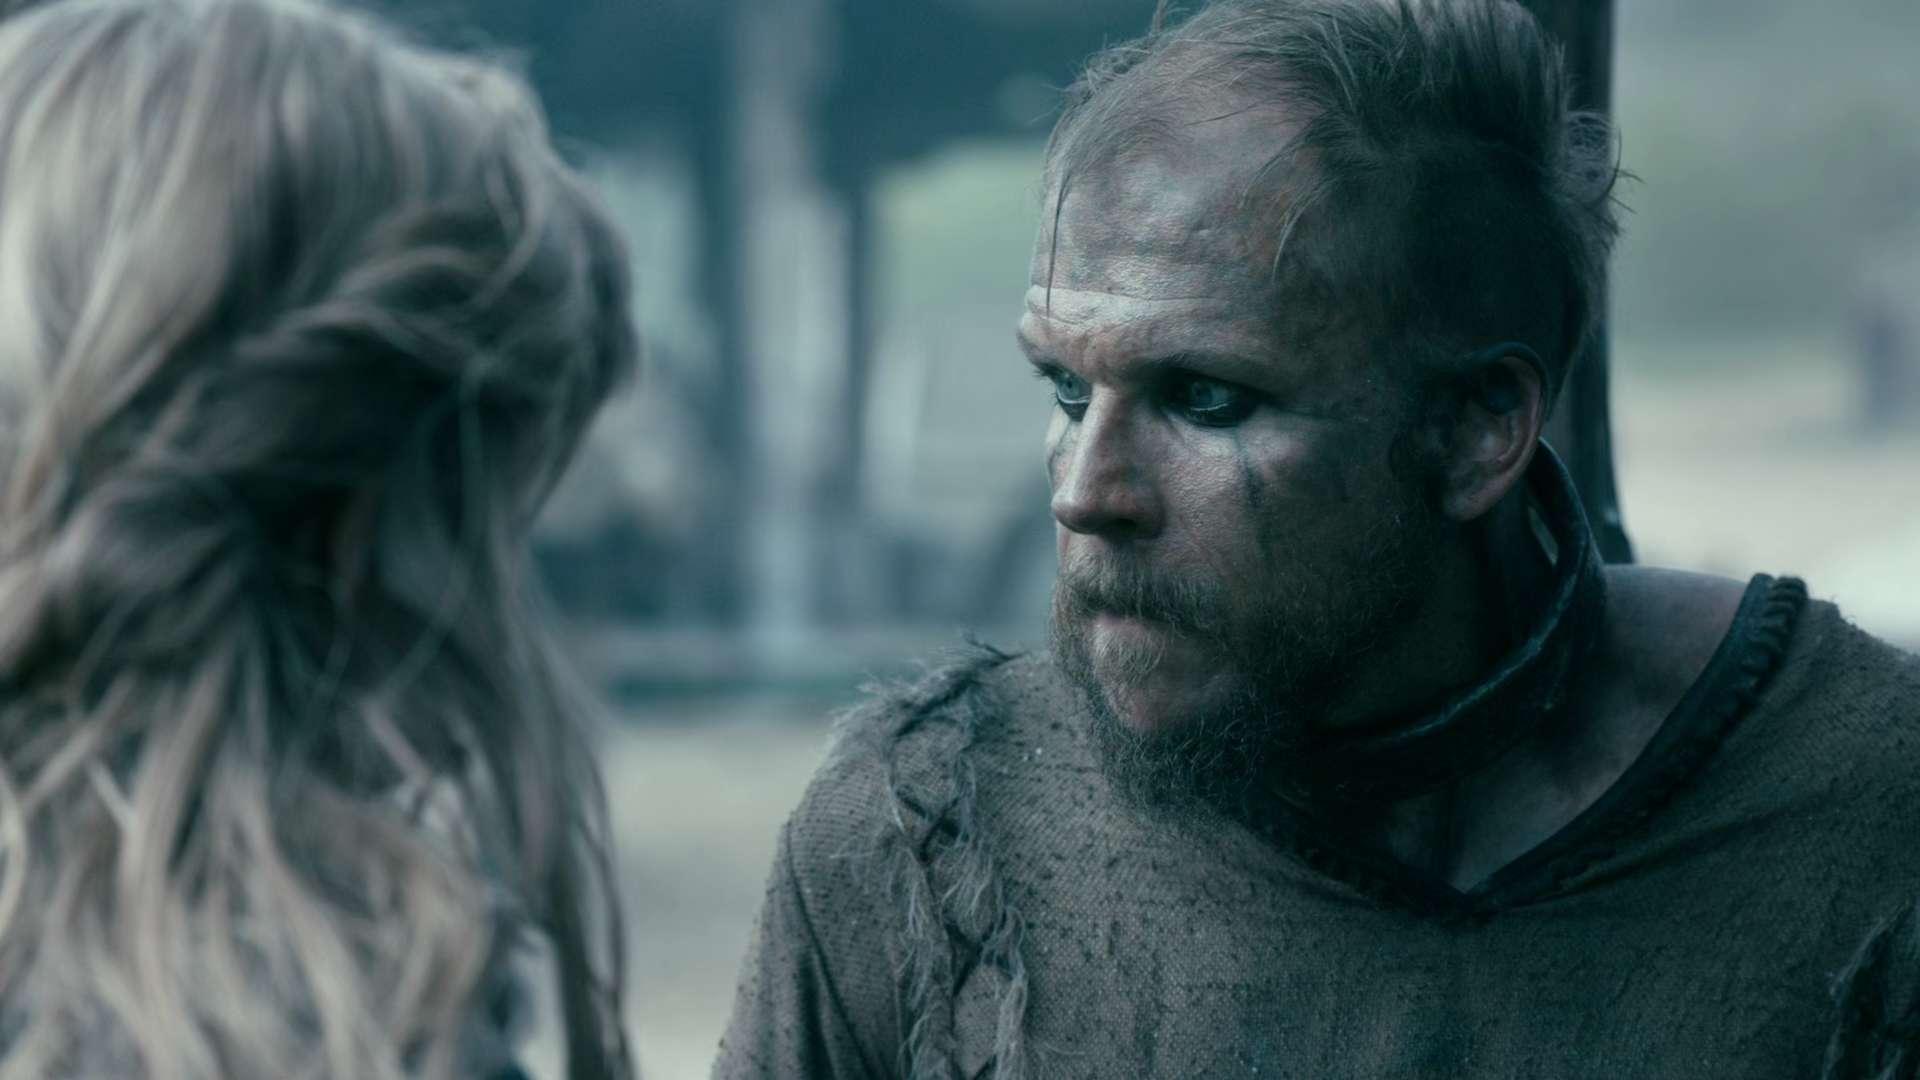 Download Vikings Season 1-4 S01-S04 1080p 10bit BluRay 5 1